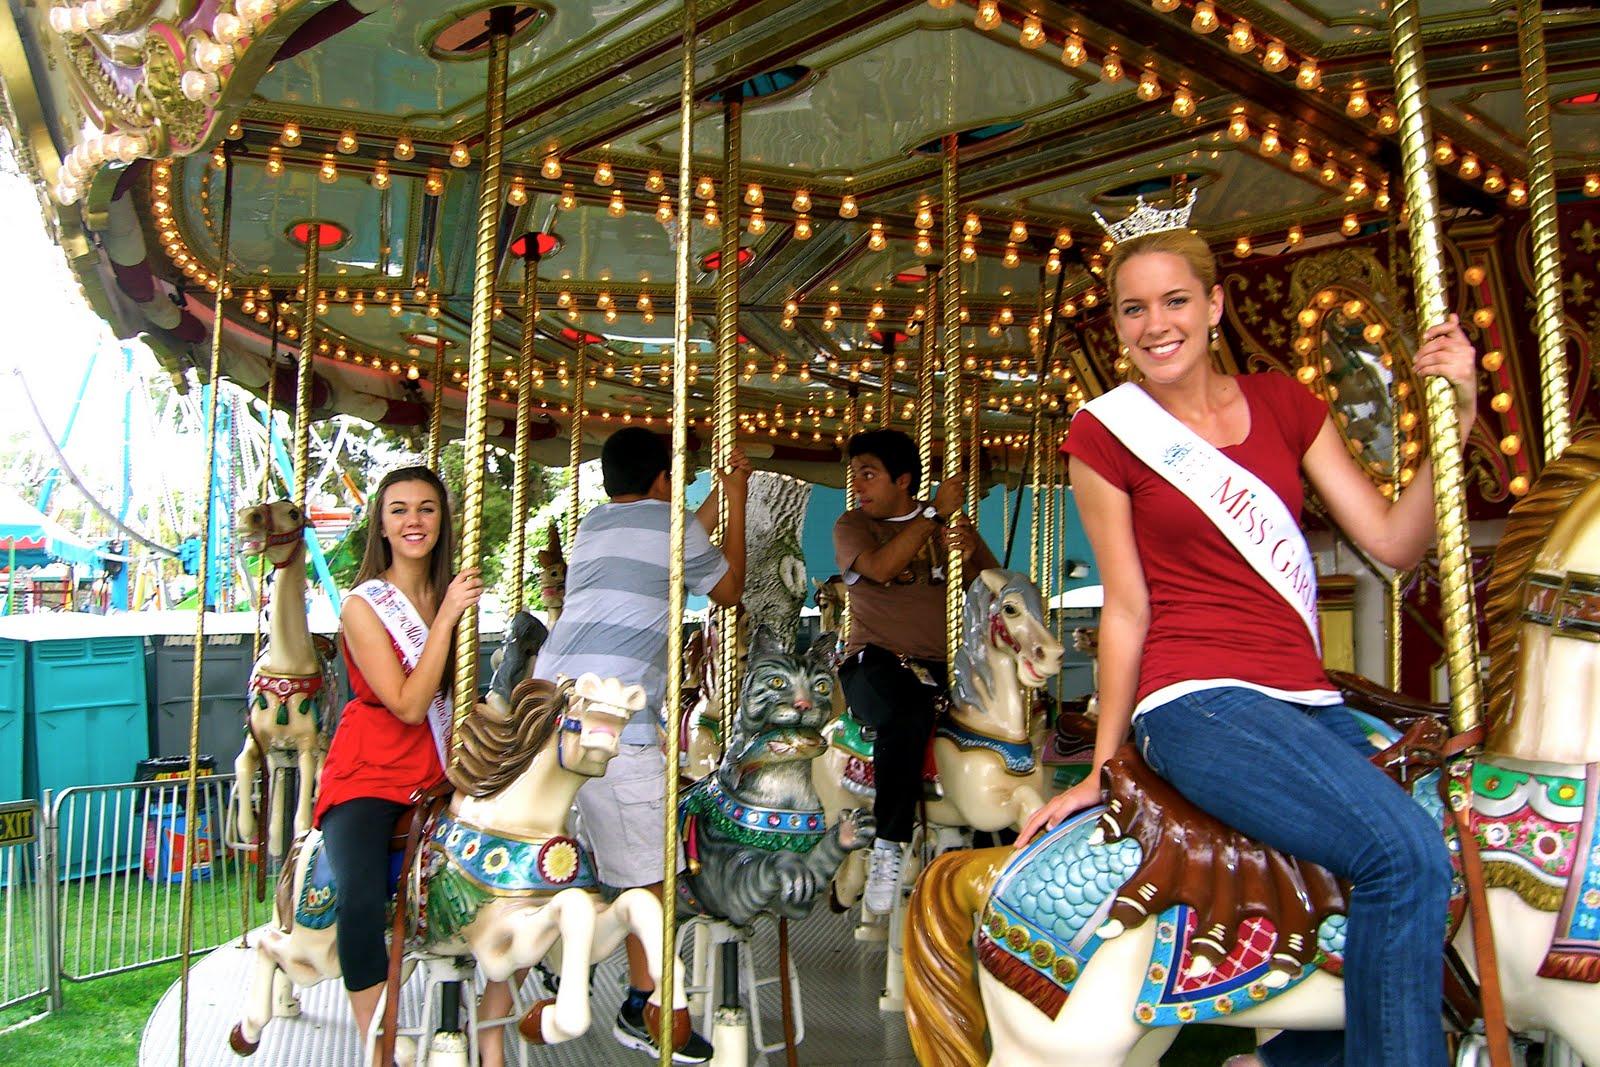 Miss Garden Grove 2011: The Strawberry Festival